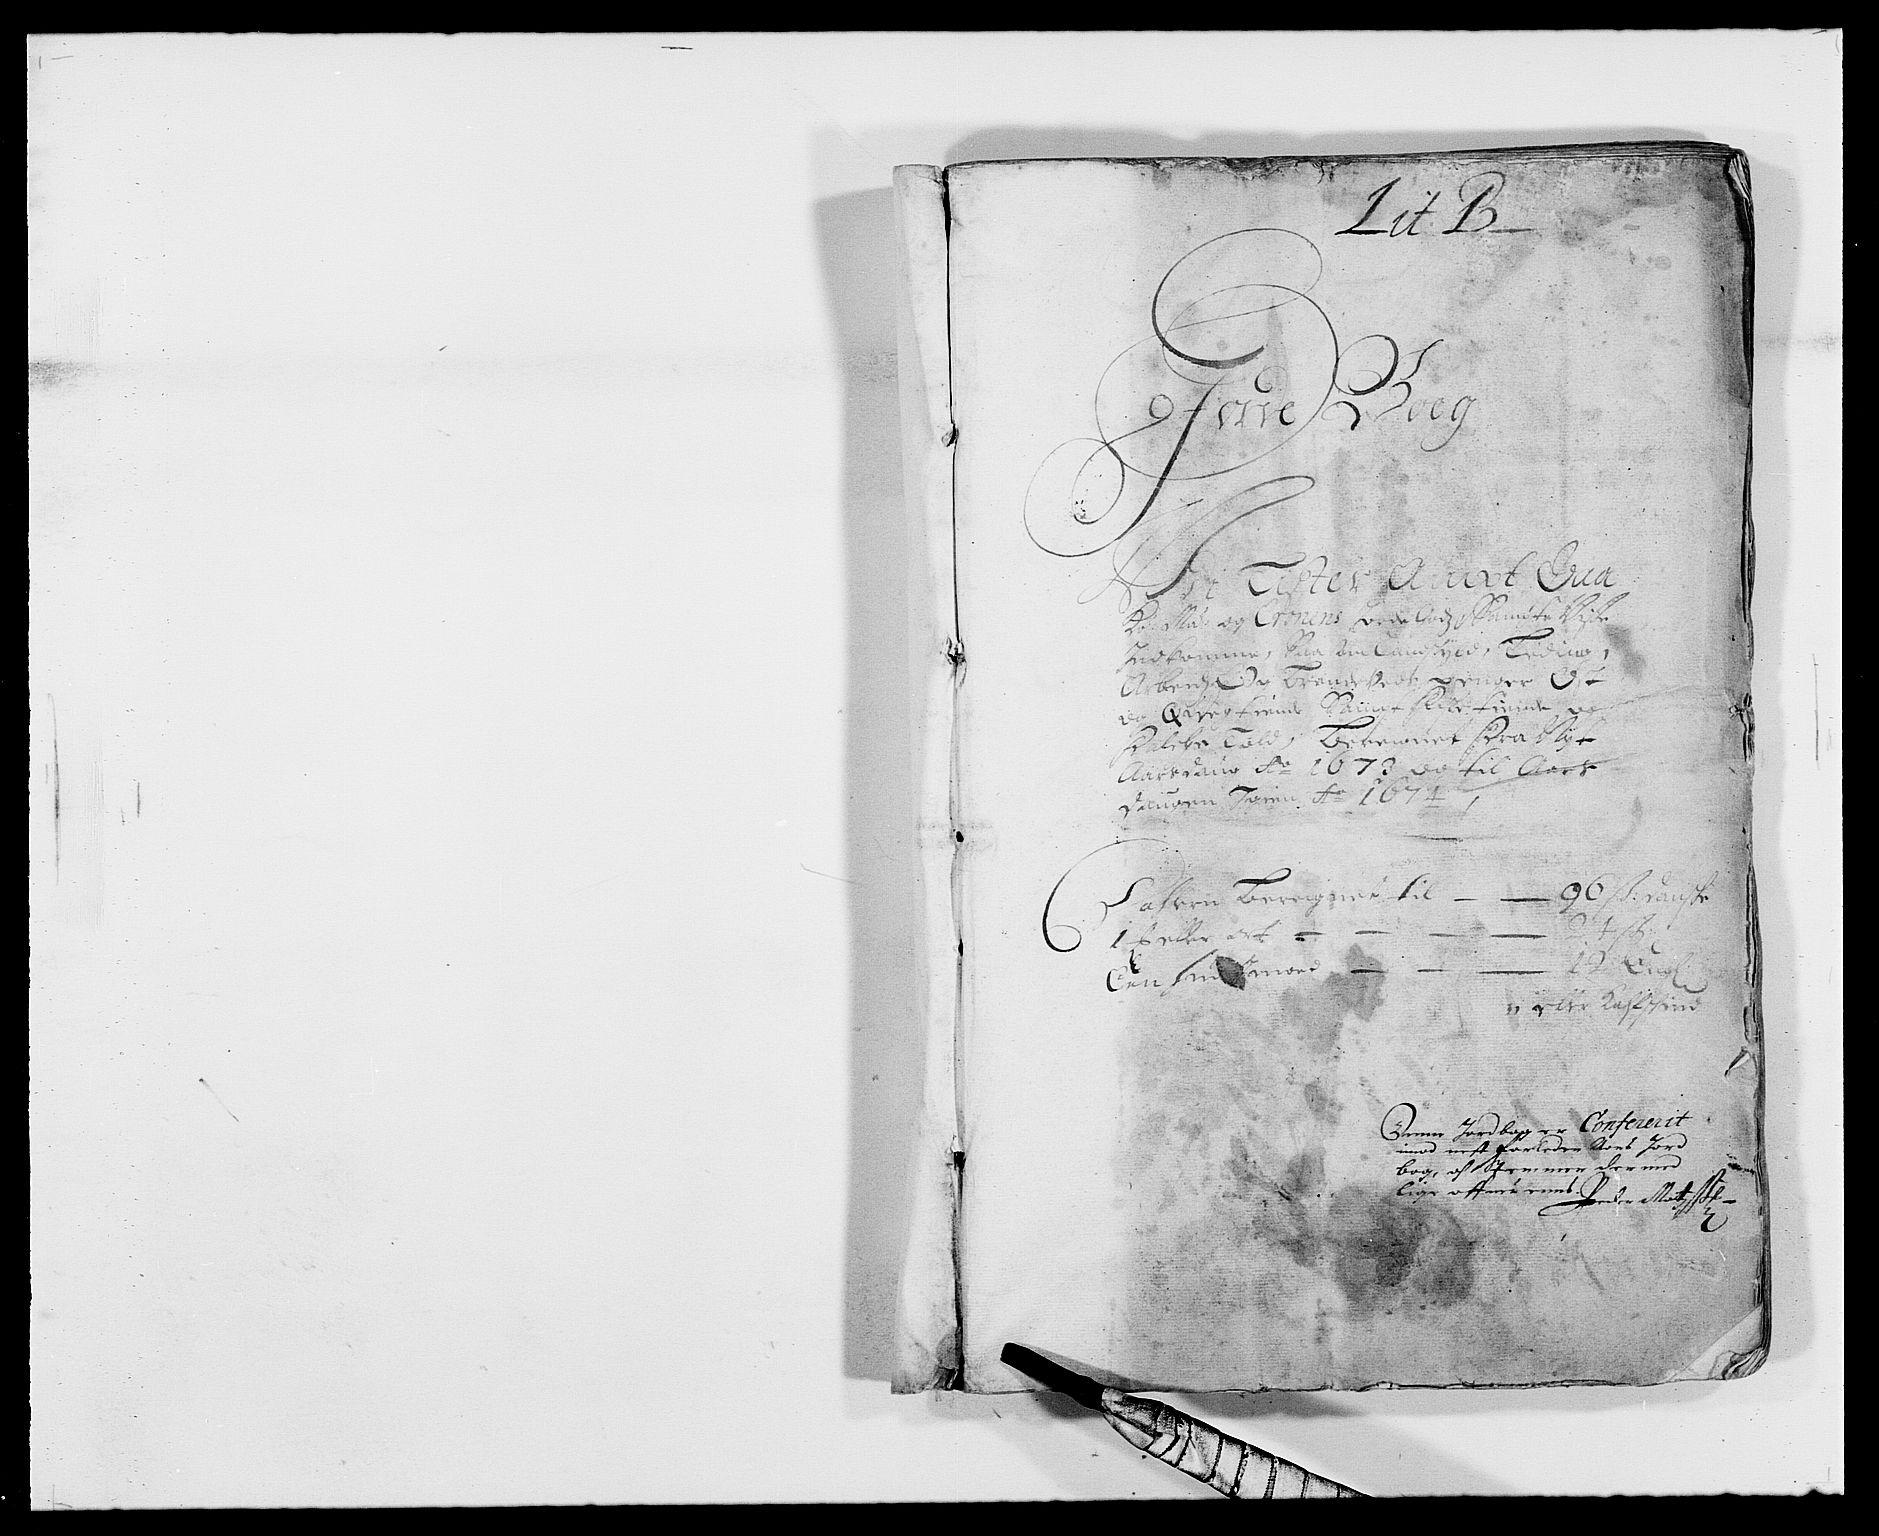 RA, Rentekammeret inntil 1814, Reviderte regnskaper, Fogderegnskap, R41/L2528: Fogderegnskap Lista, 1673-1674, s. 9